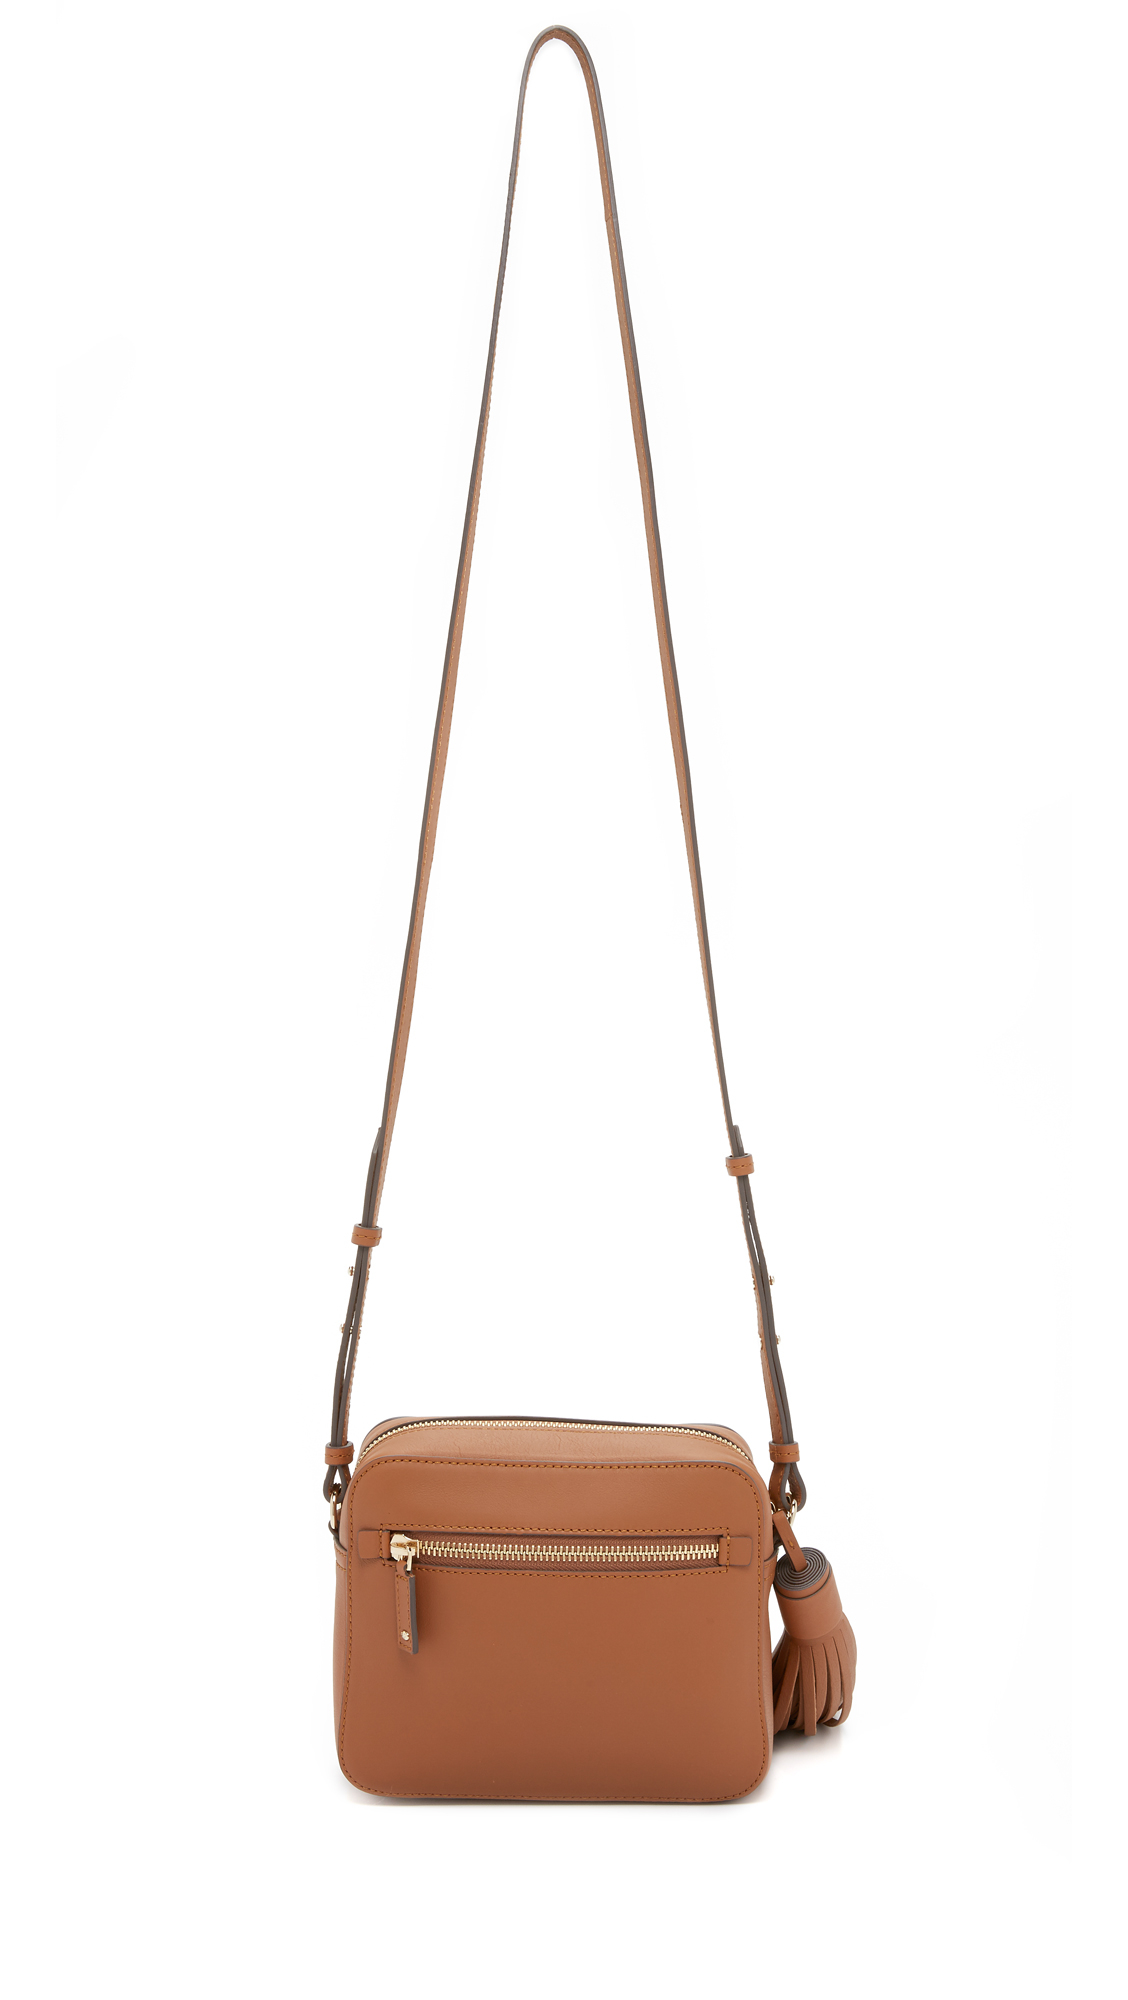 Anya Hindmarch Rainbow Cross Body Bag in Caramel (Brown)